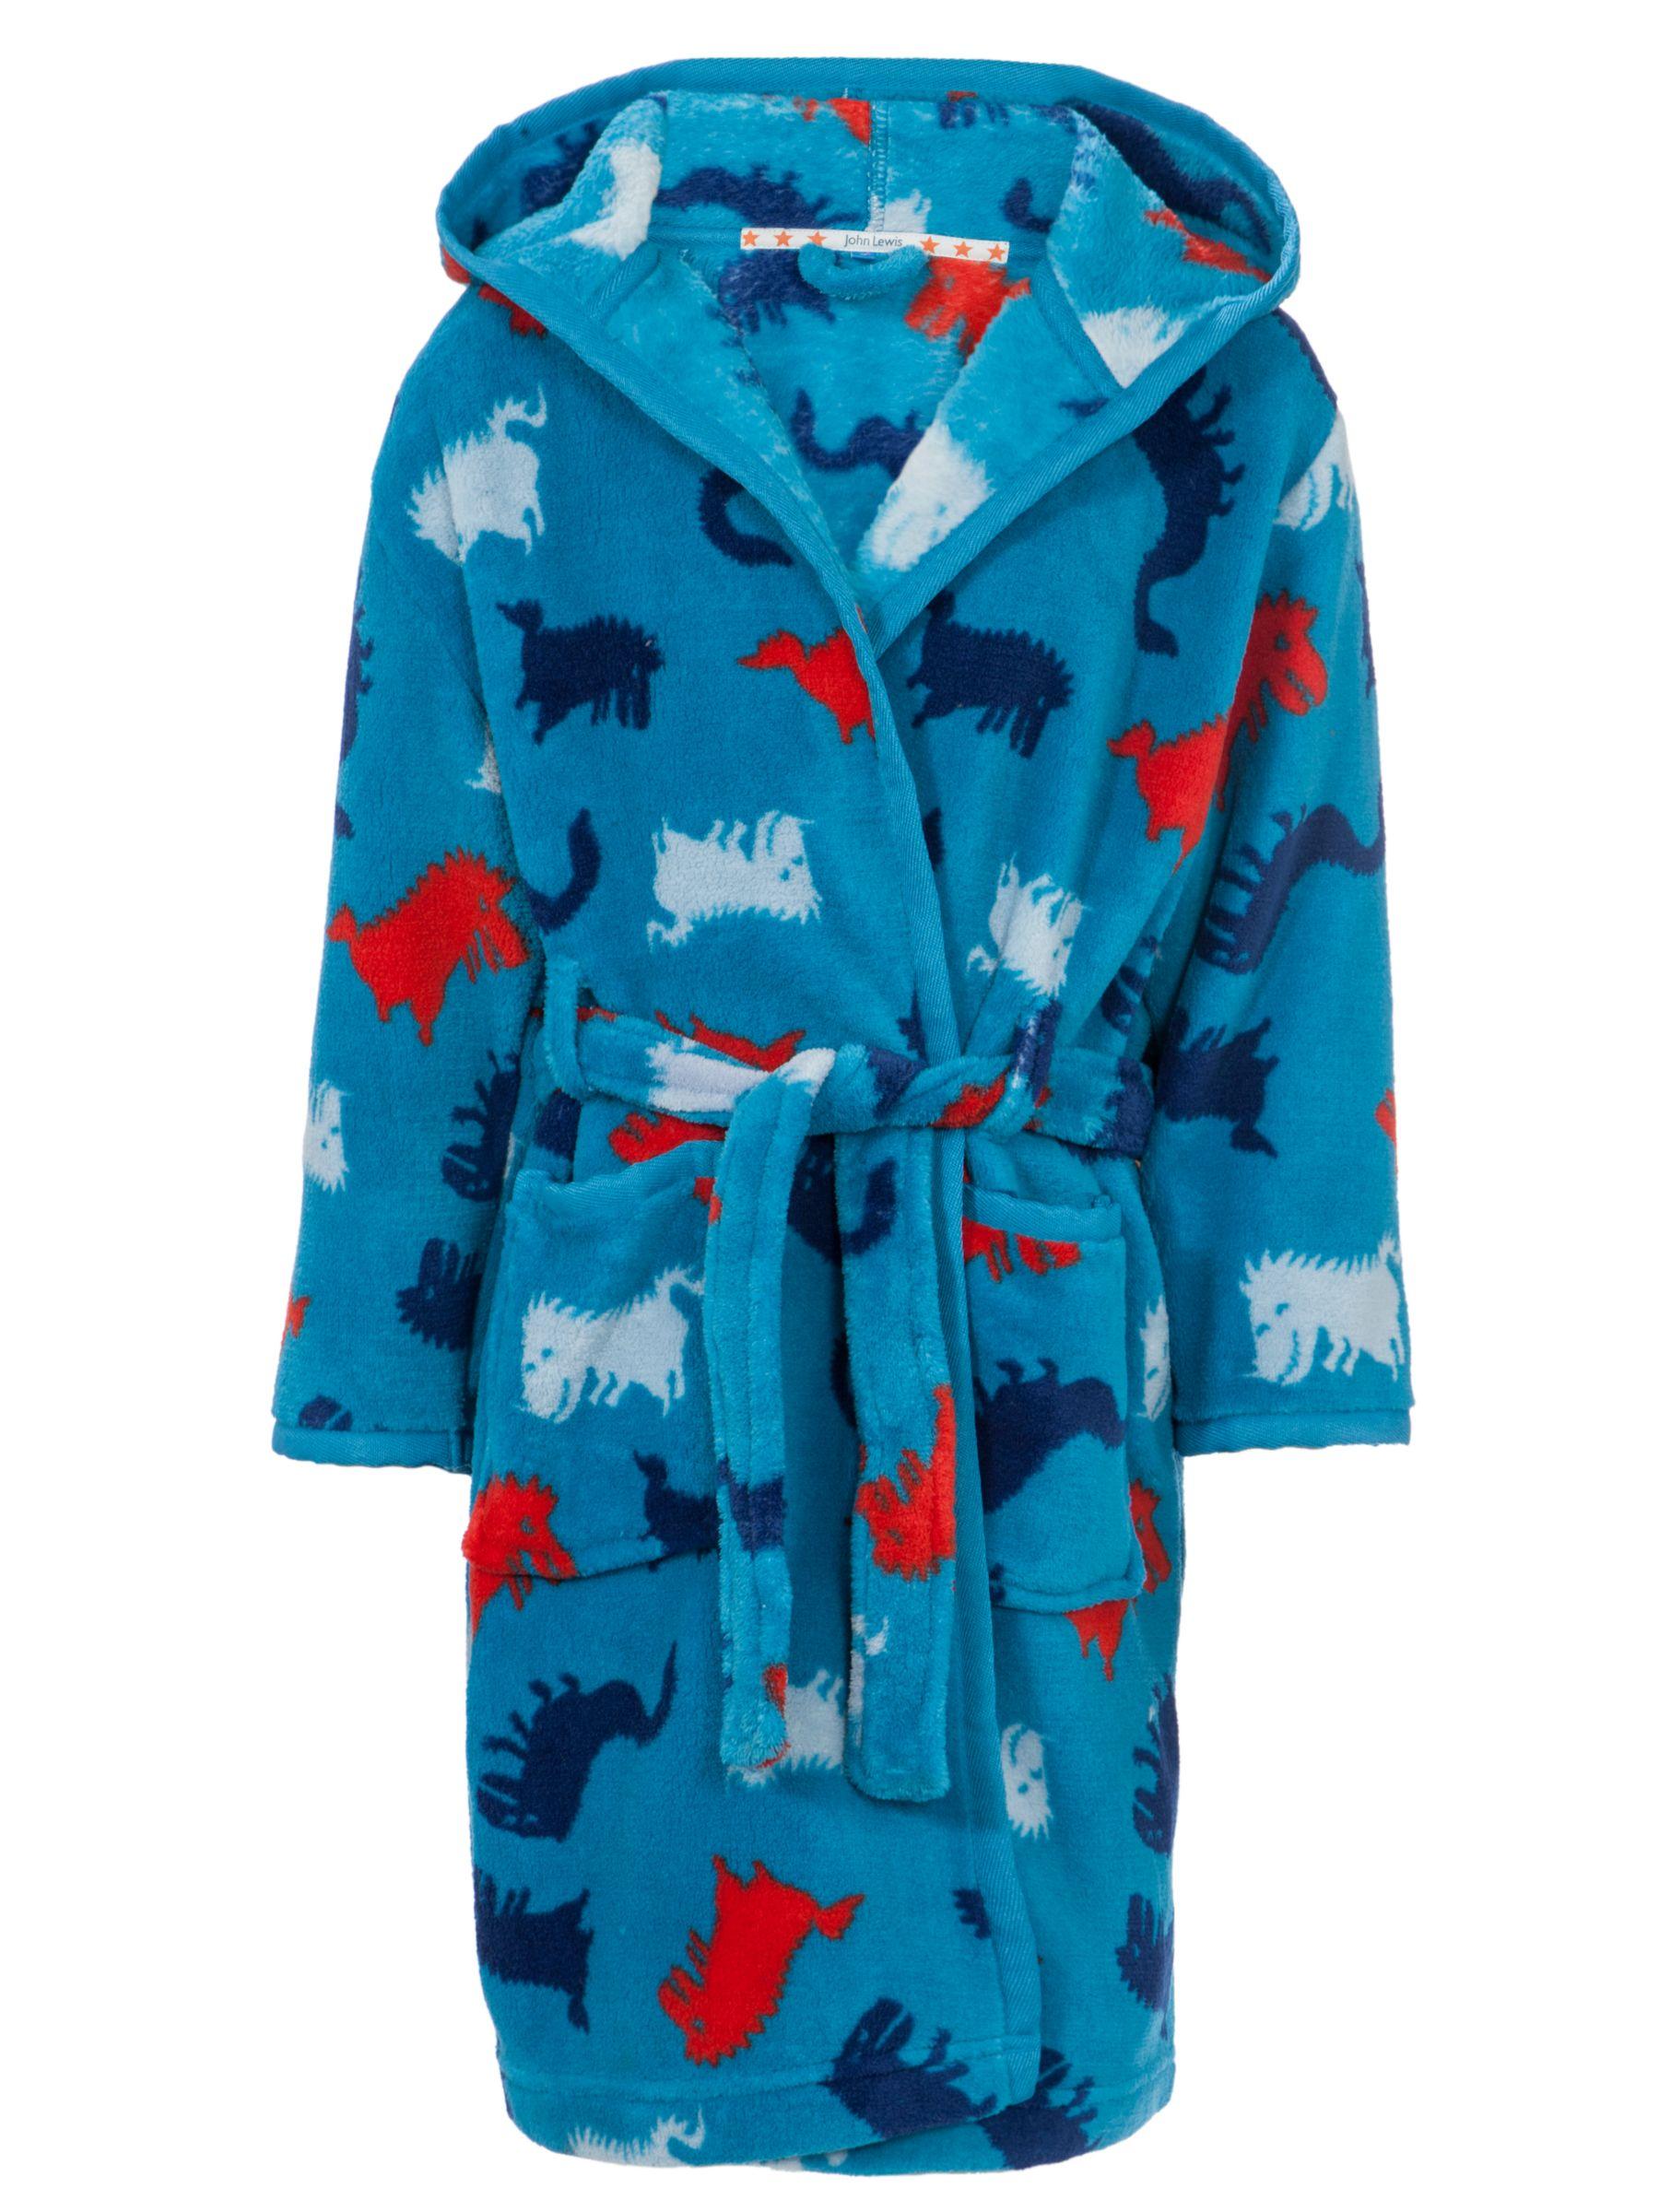 John Lewis Boy Dino Robe, Blue